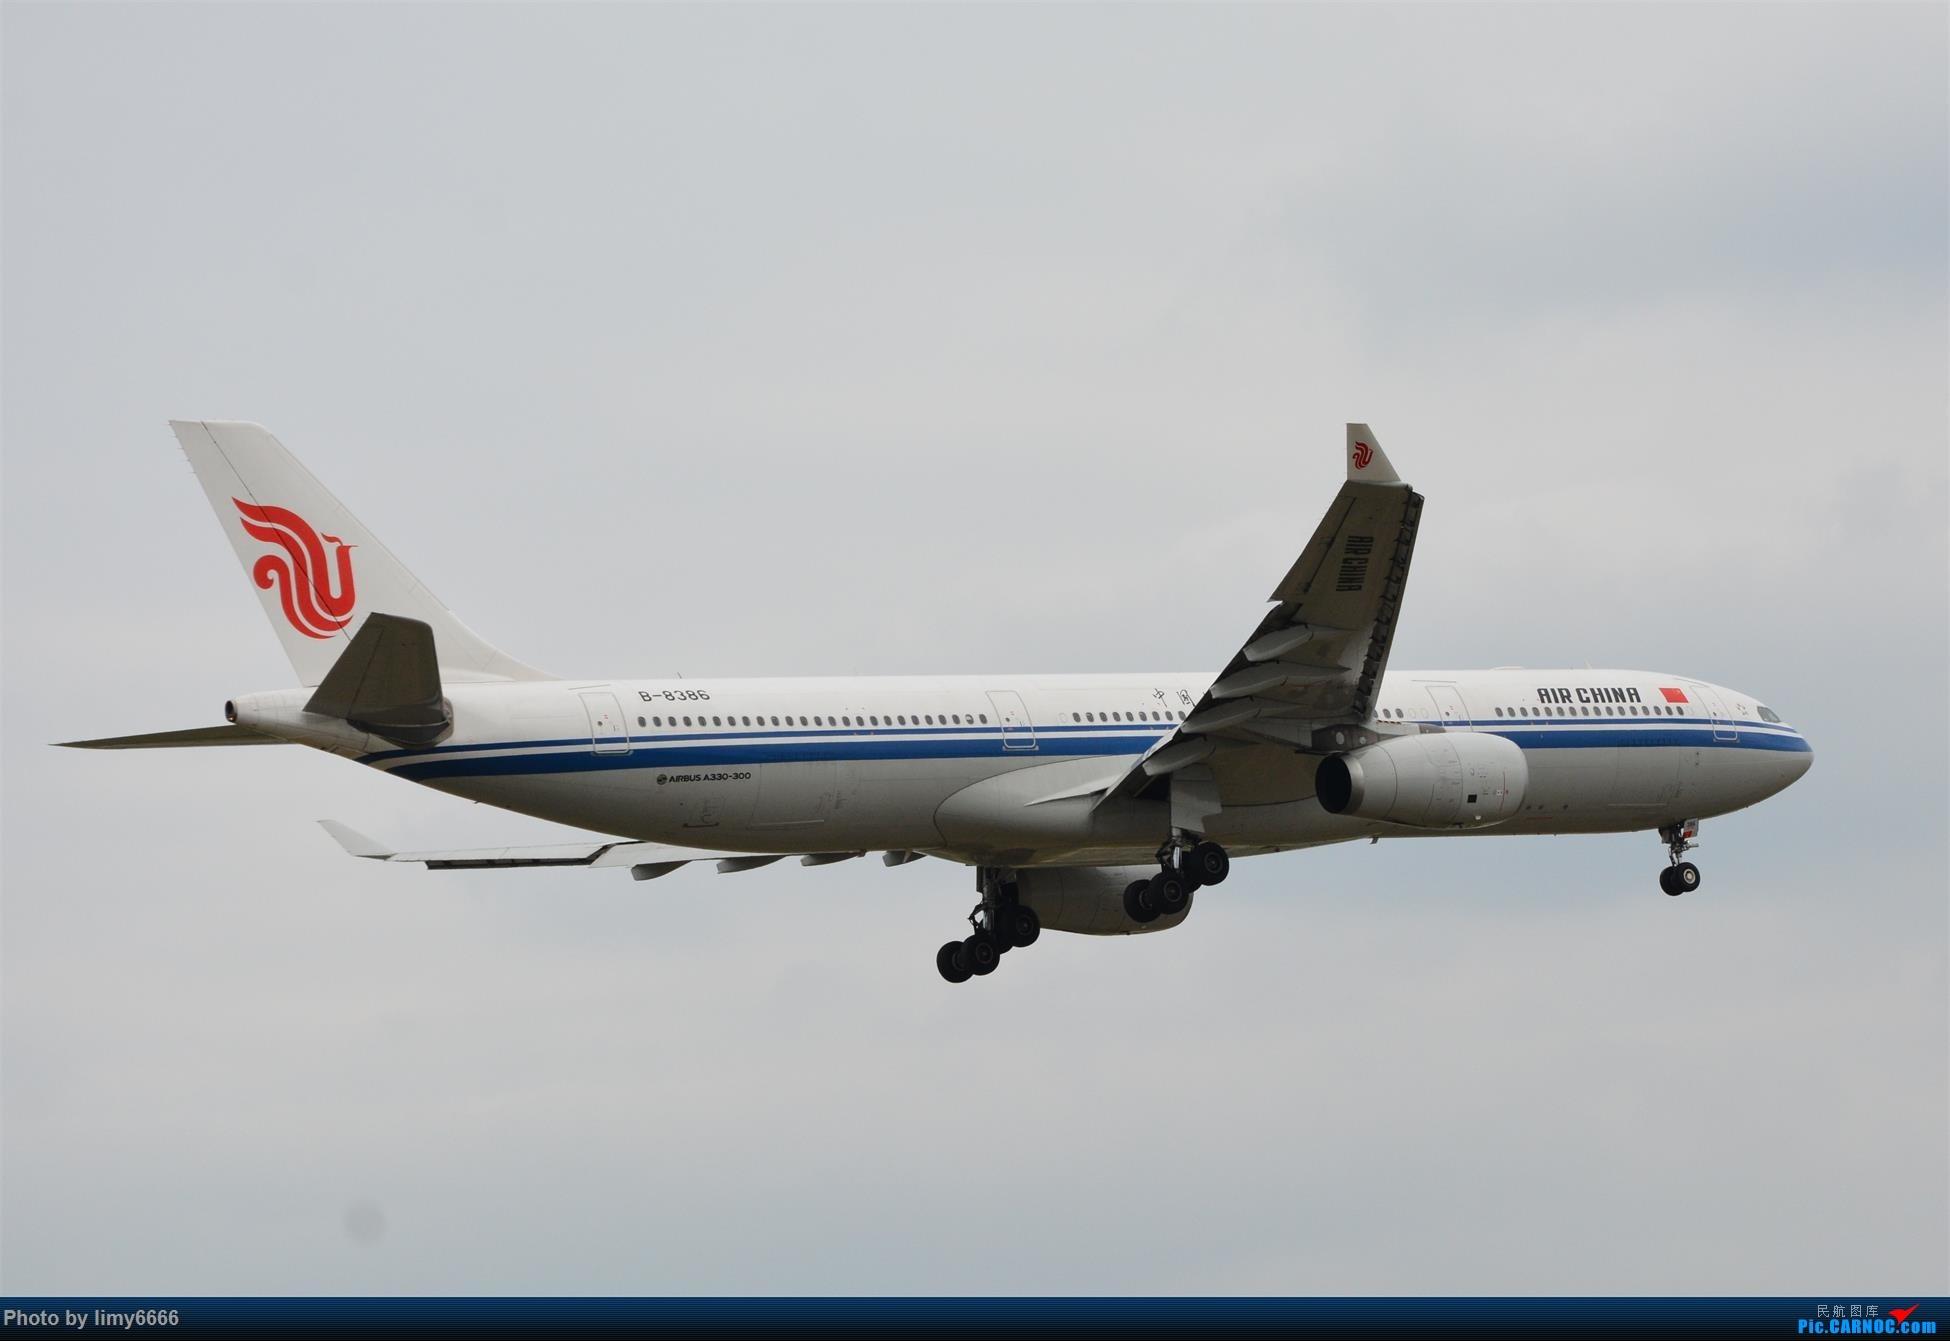 Re:[原创]上海虹桥机场拍机(在贵阳很少见或看不见的) AIRBUS A330-300 B-8386 中国上海虹桥国际机场